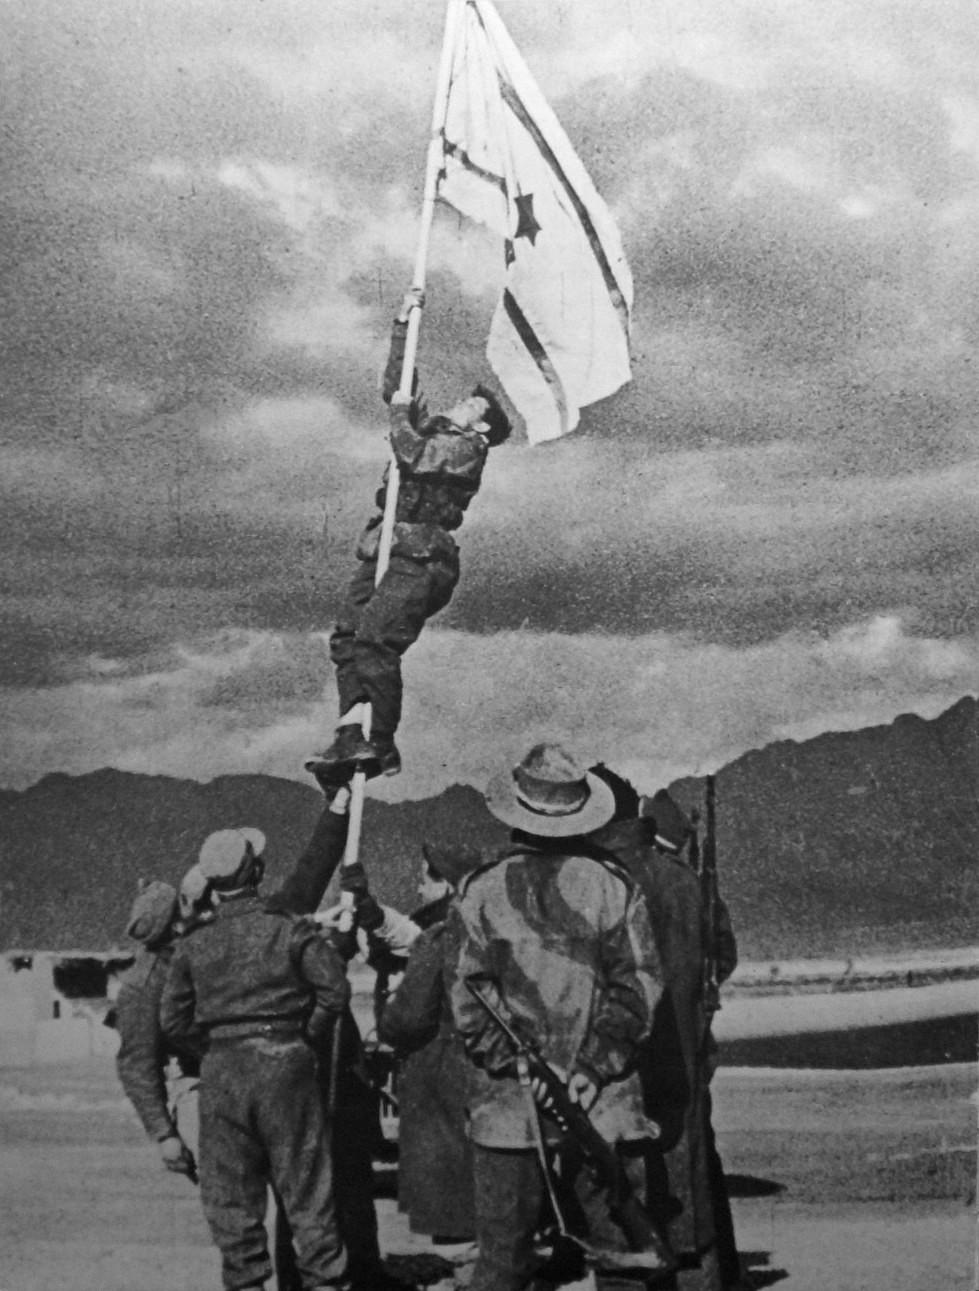 Arab israeli war 1948 pdf converter